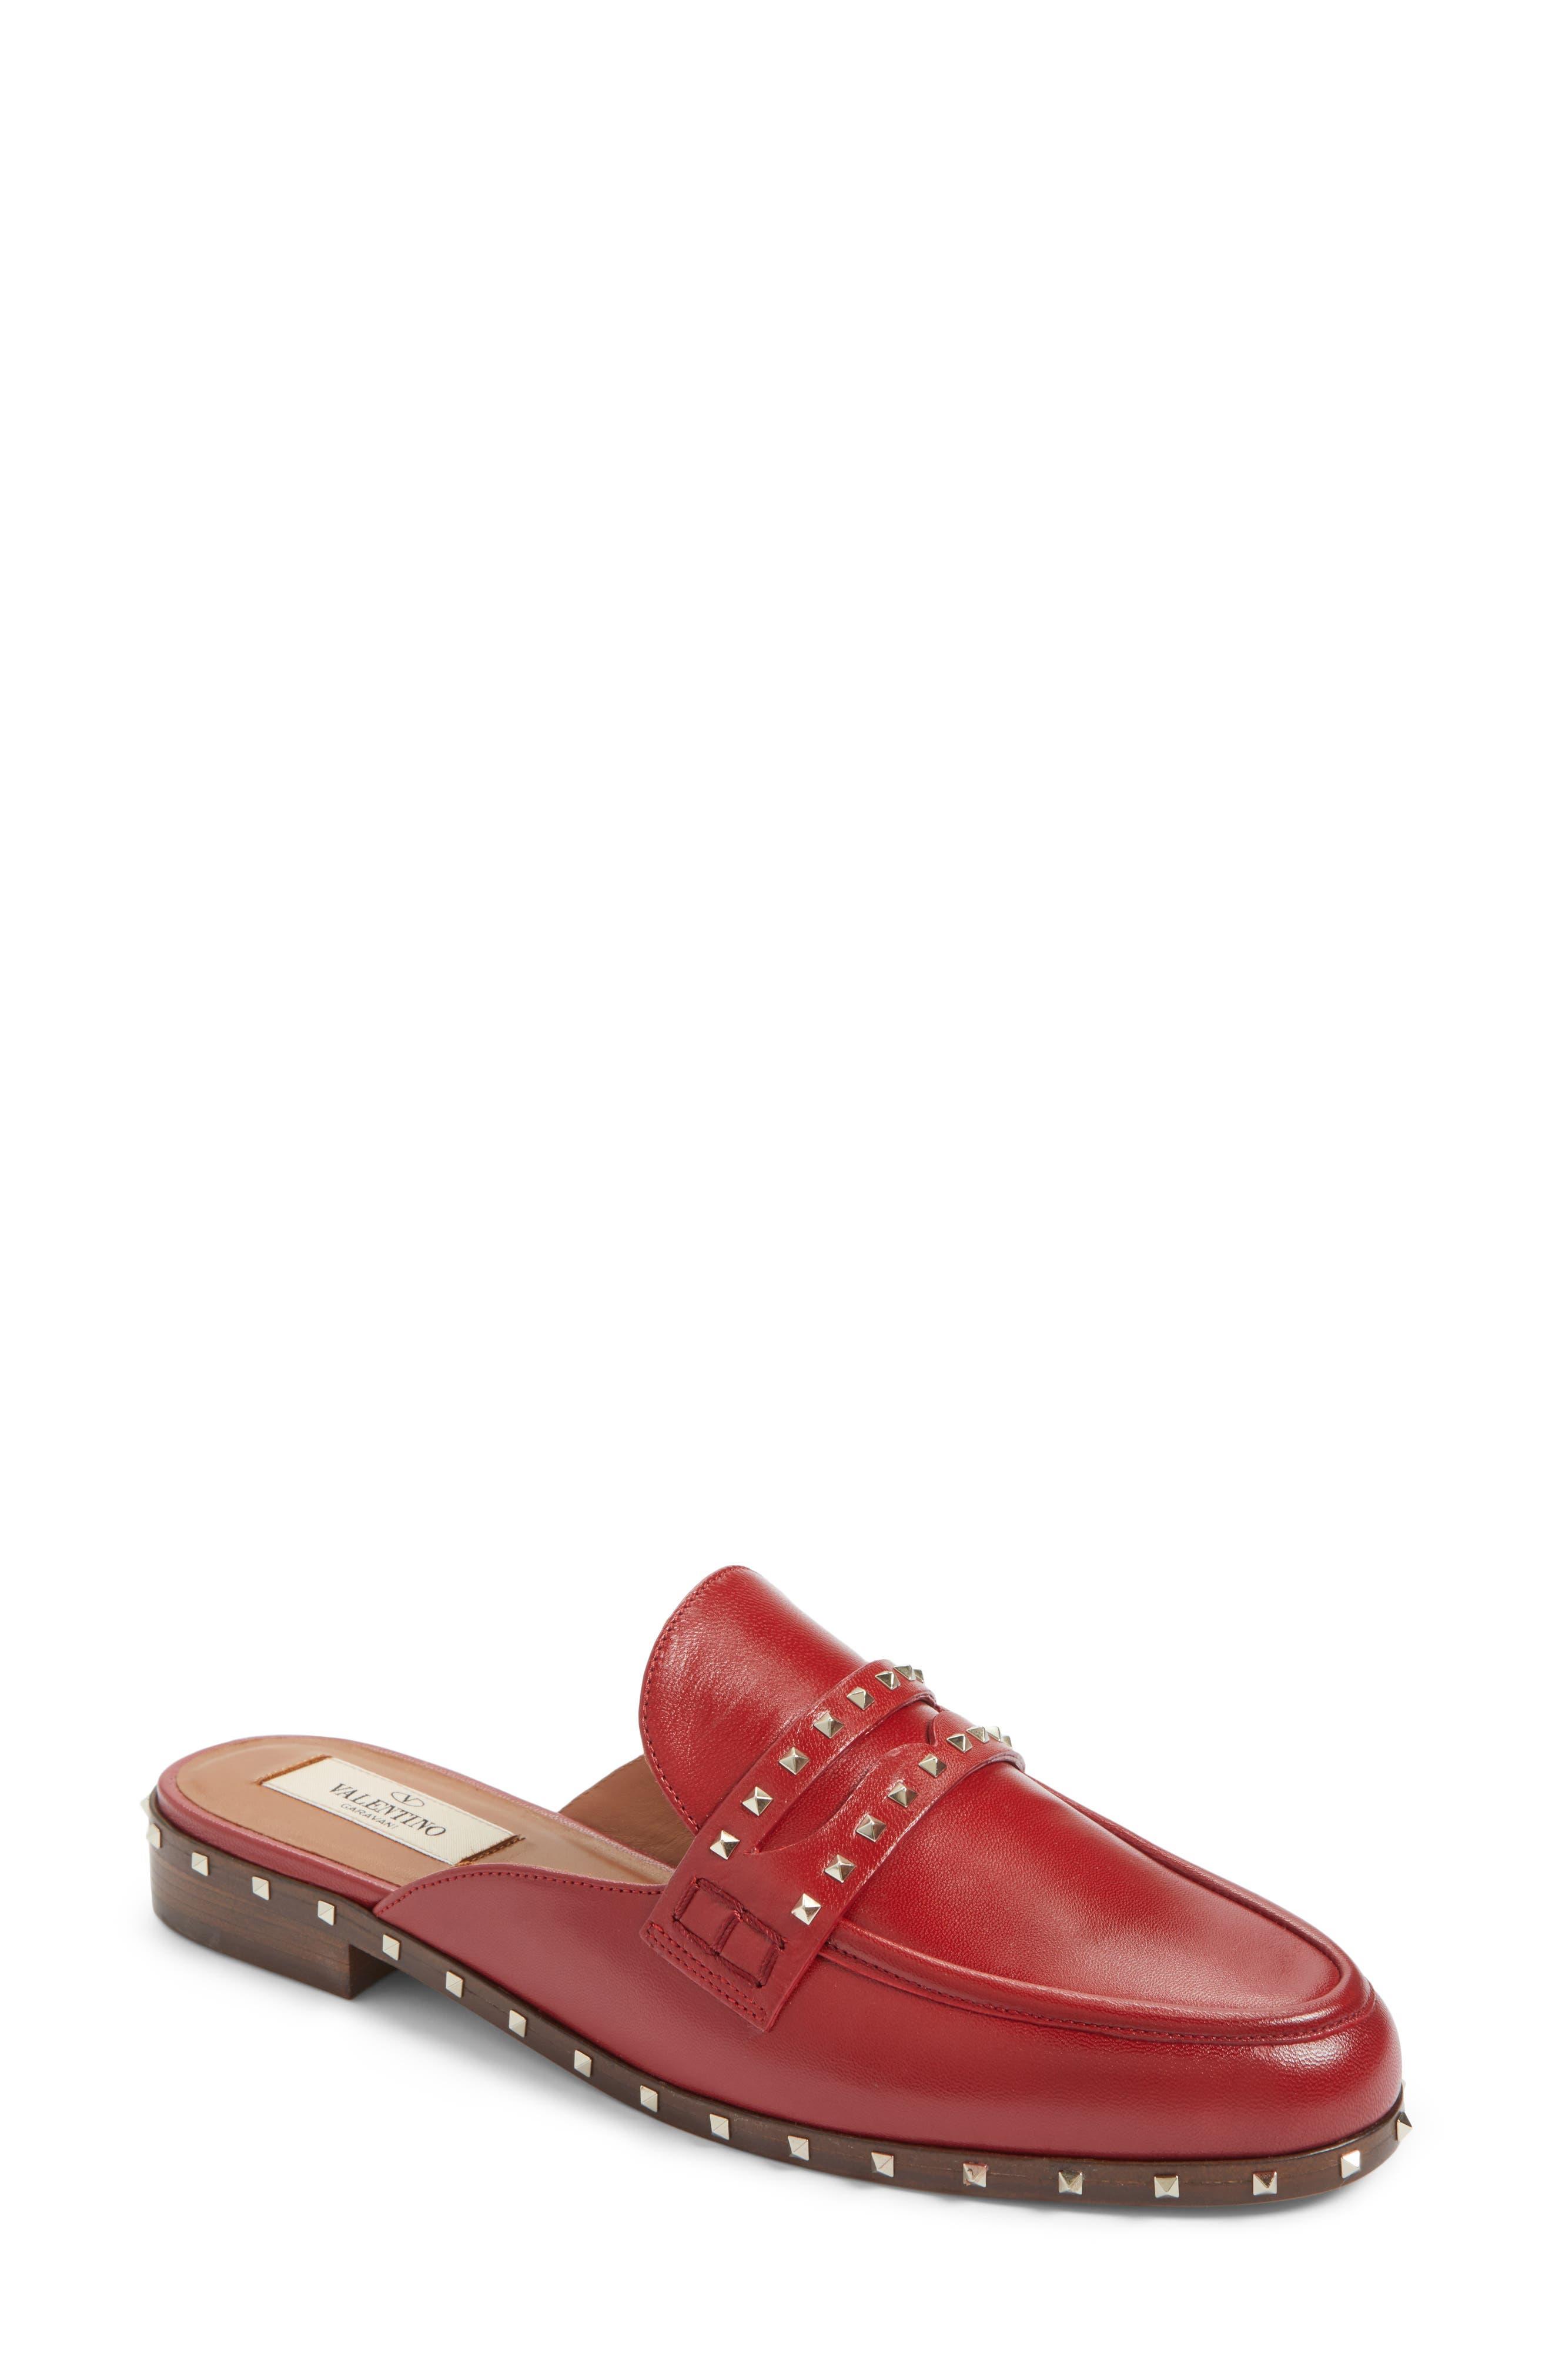 Soul Rockstud Loafer Mule,                         Main,                         color, Red Leather